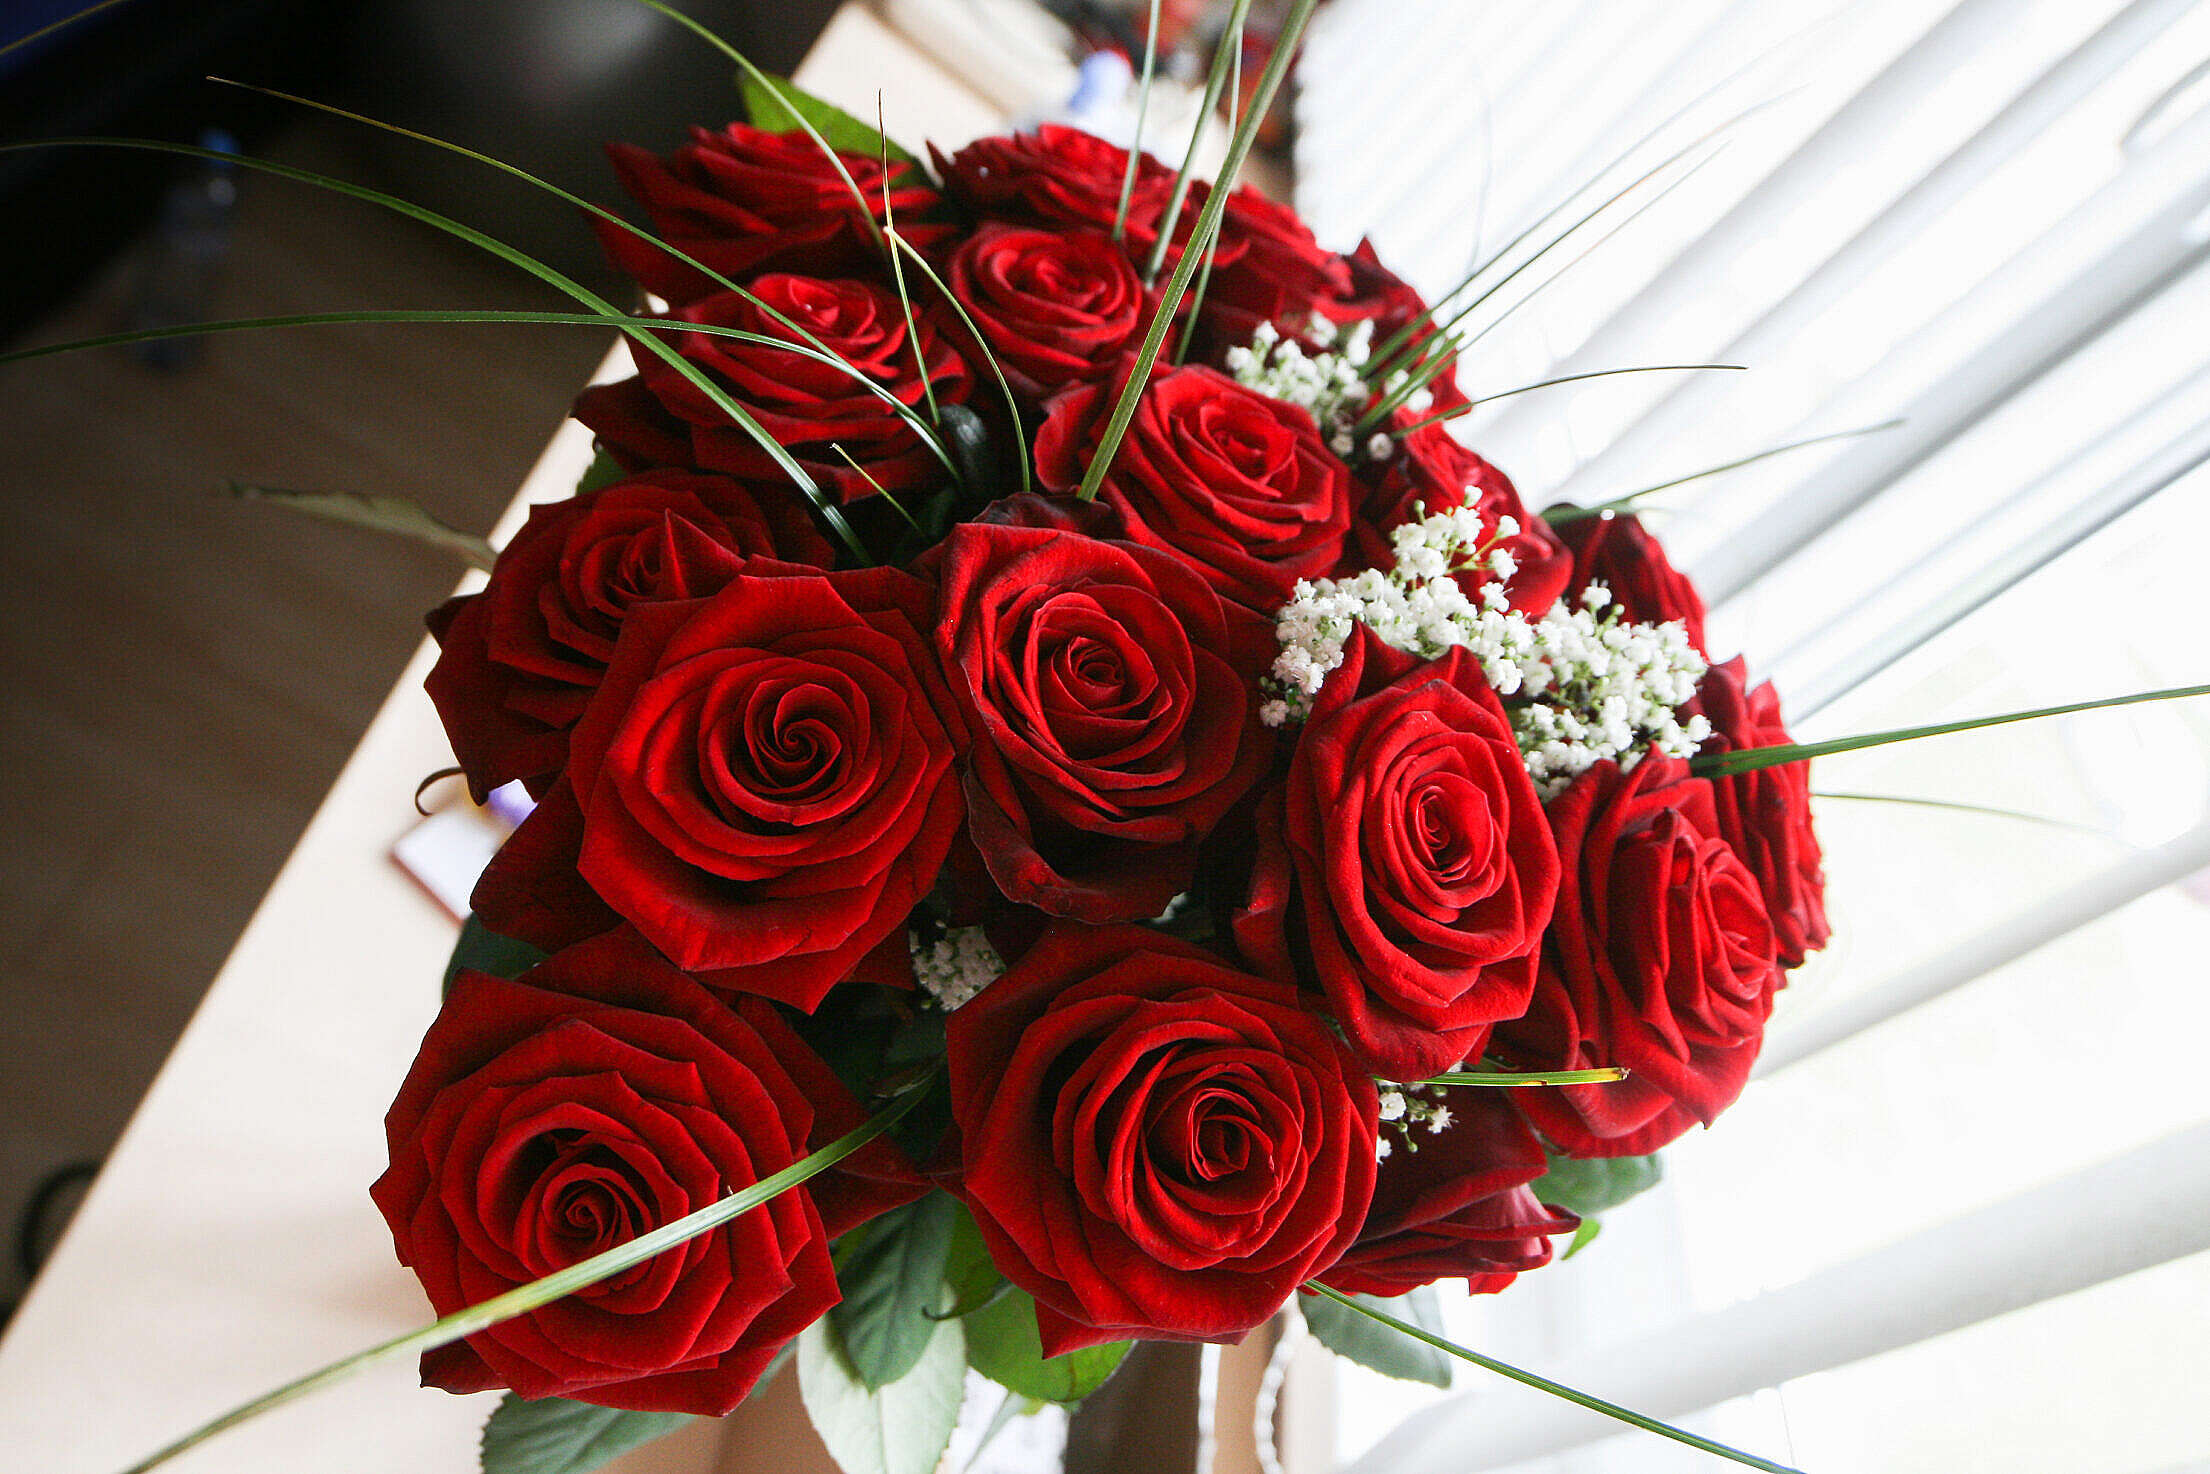 Girls Love Roses Free Stock Photo